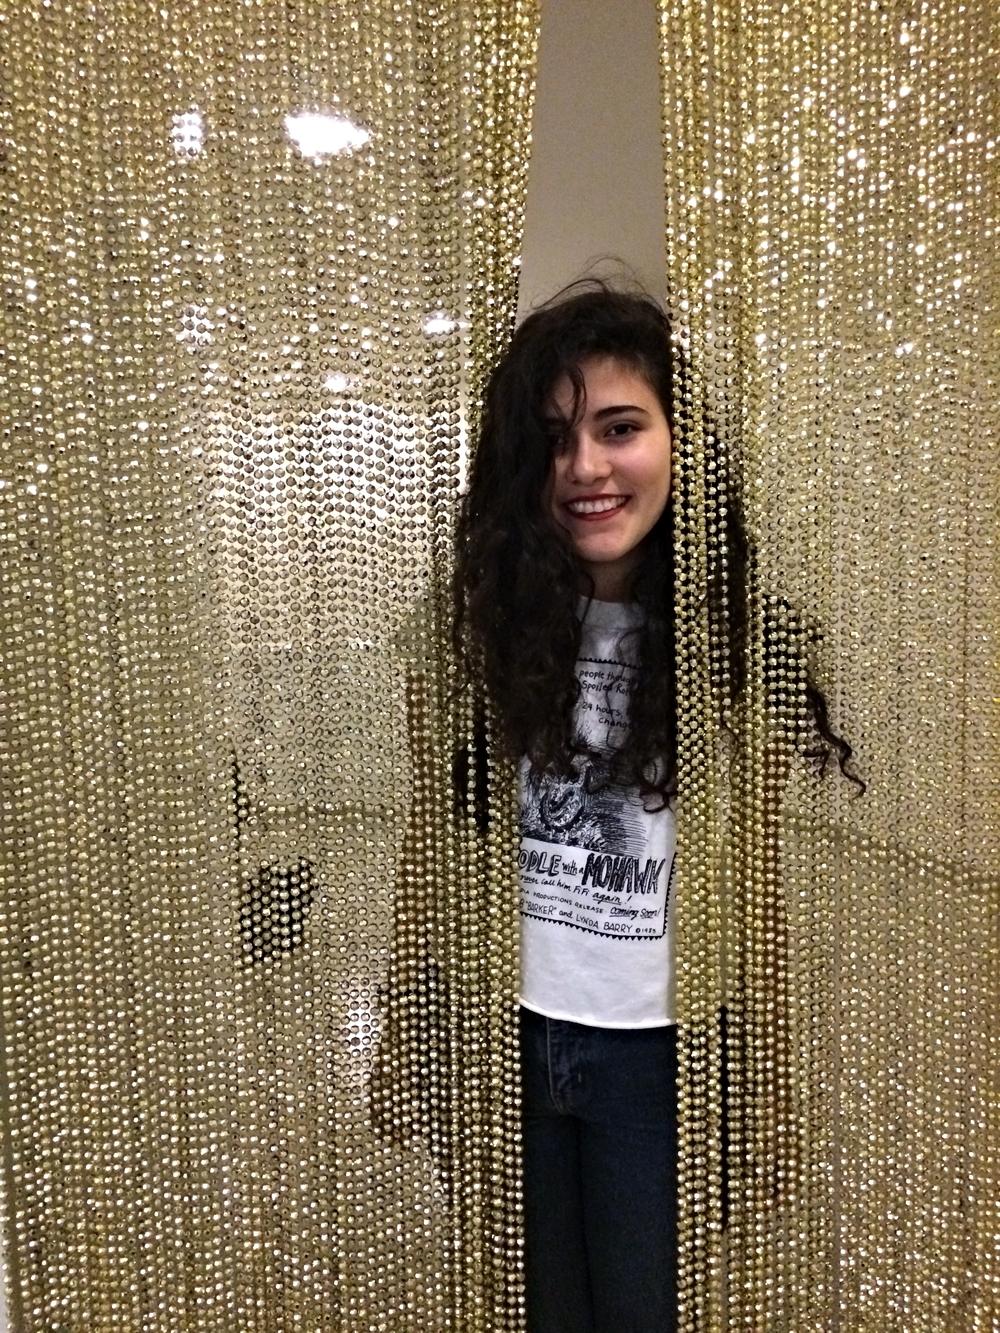 Meet Andi as she parts Felix Gonzalez-Torres'golden curtains ( Untitled (Golden)  at the Guggenheim Museum.